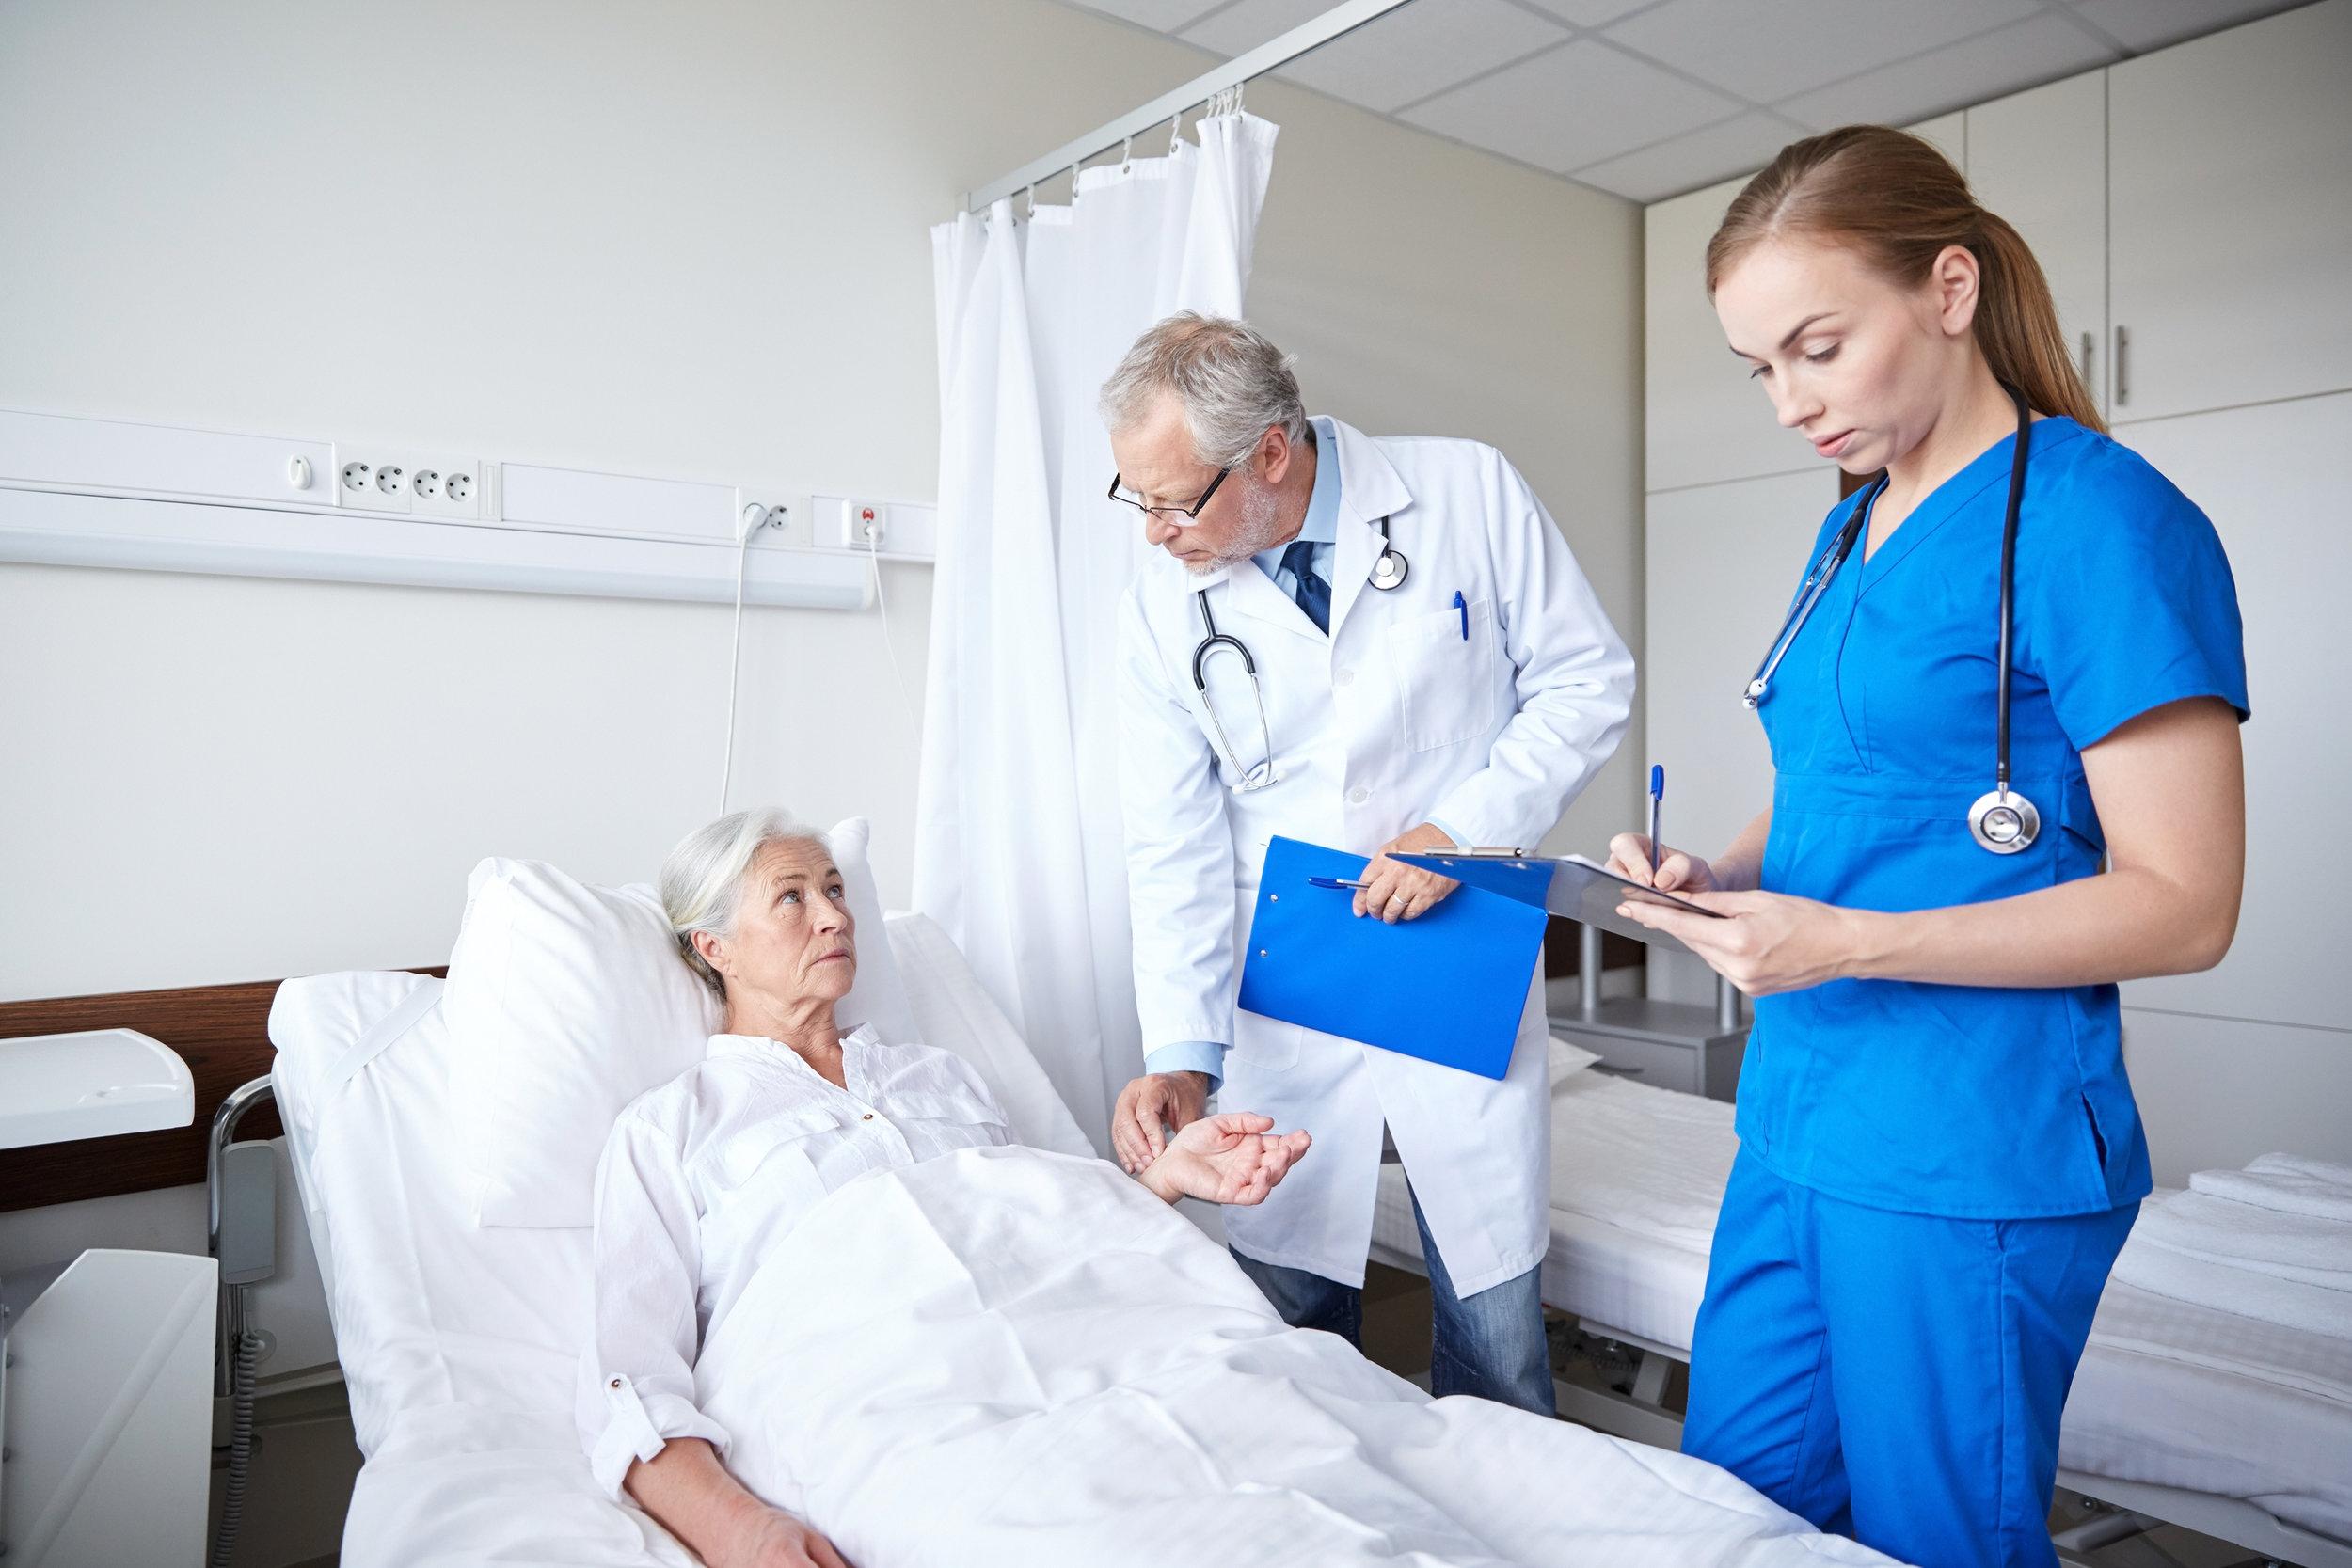 3 Ways Labor Optimization Can Improve Your Hospital's Bottom Line